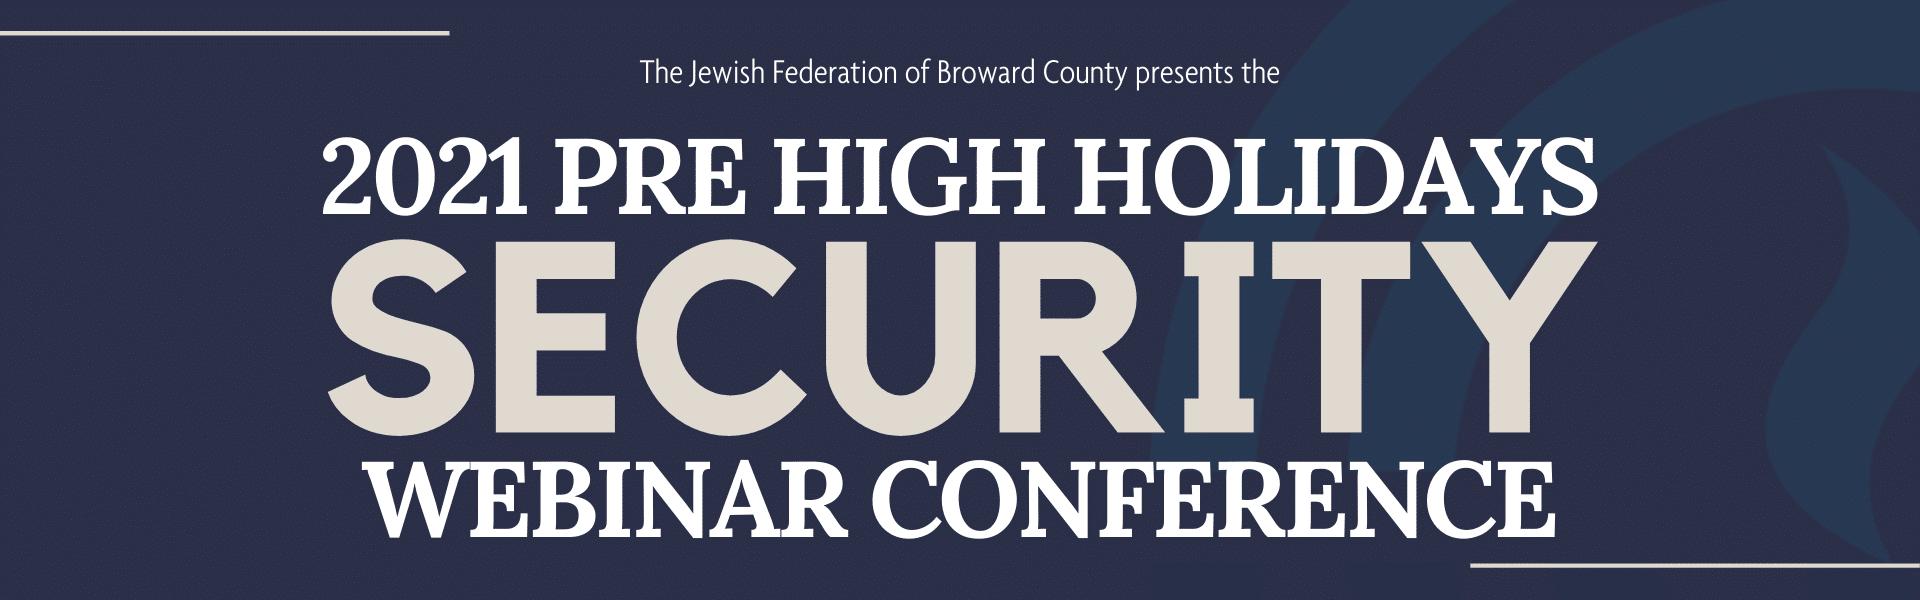 Security Conference Website Banner